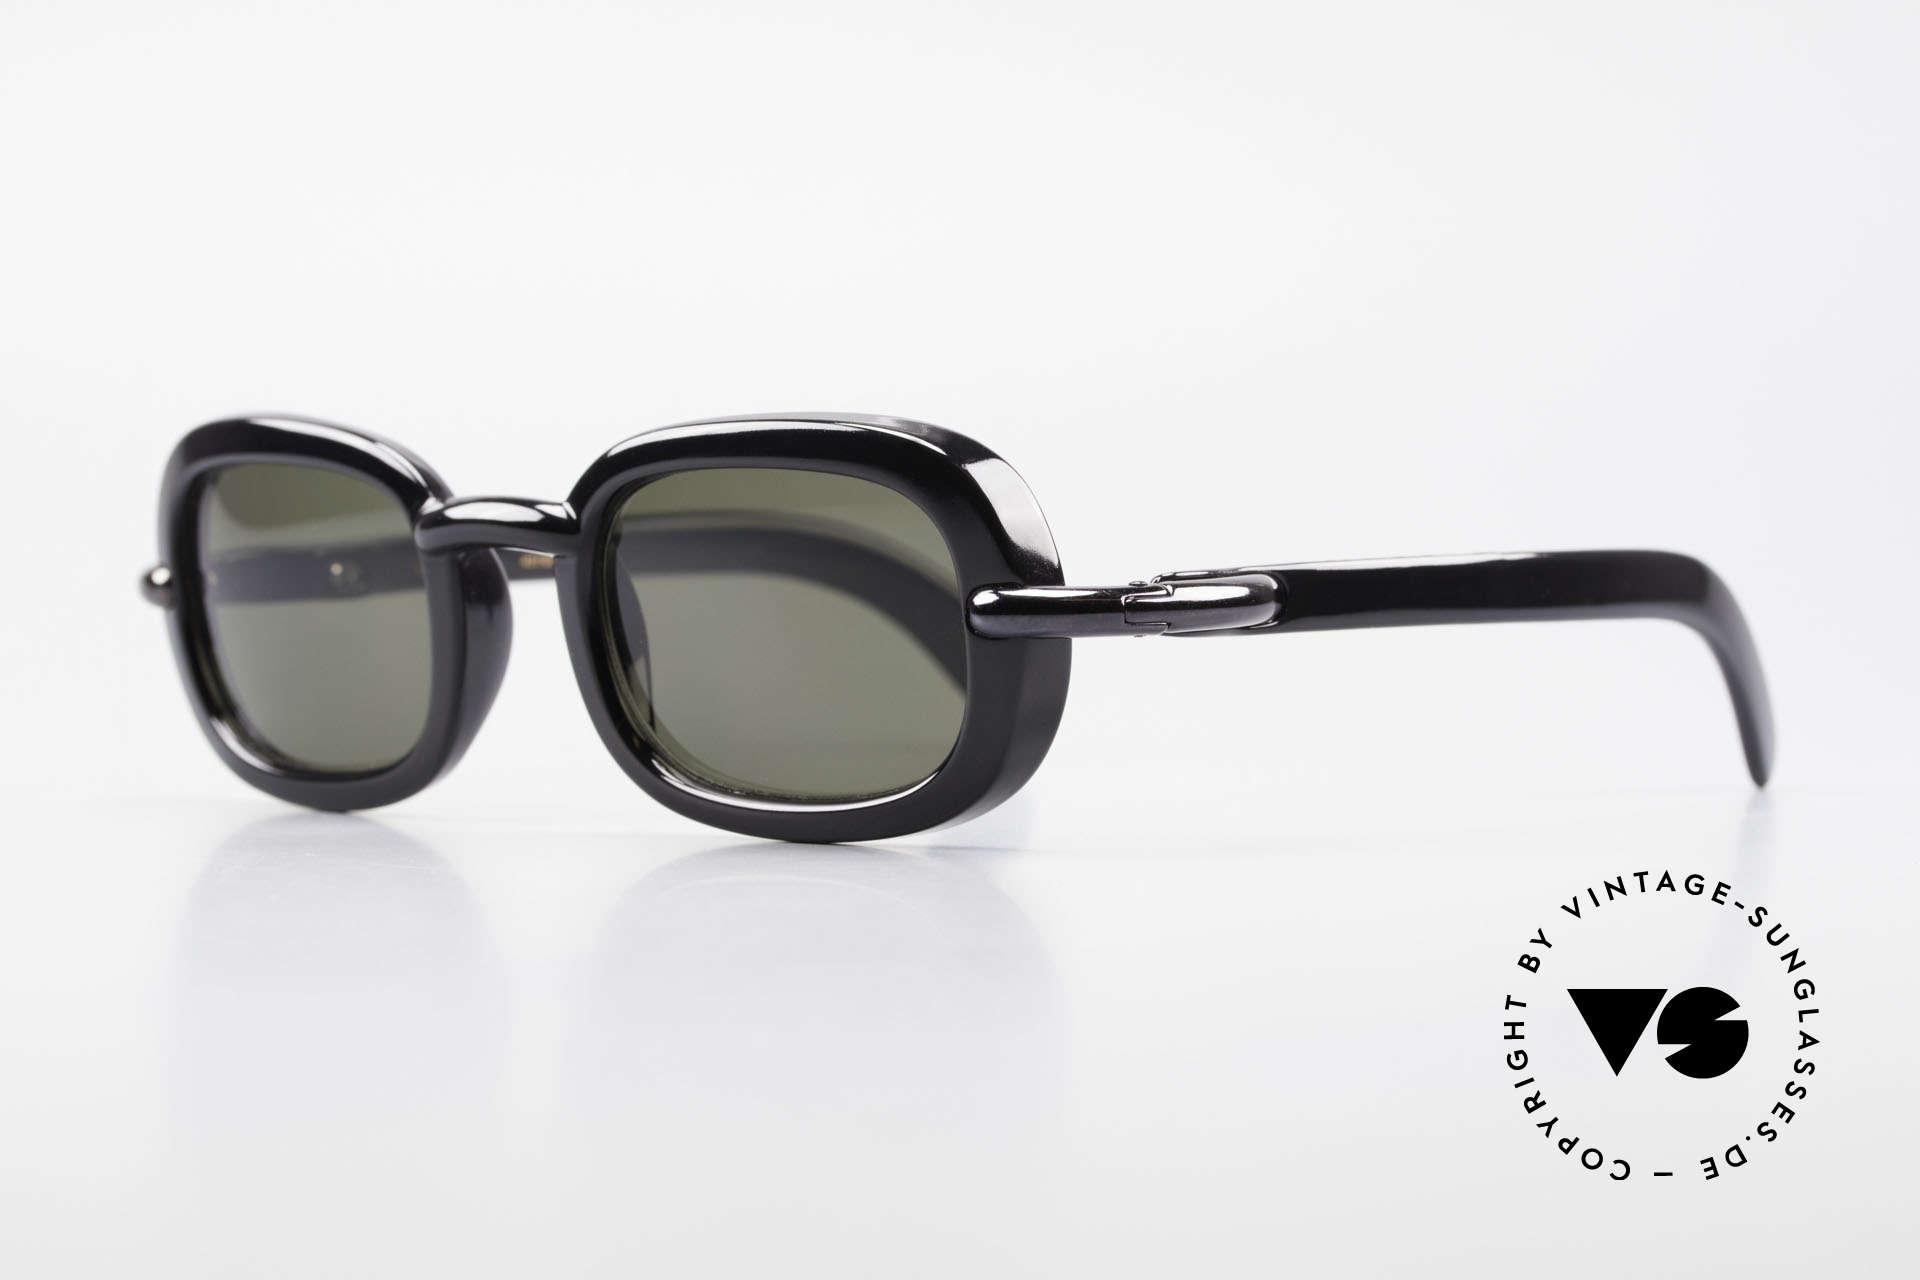 Karl Lagerfeld 4117 Rare 90's Ladies Sunglasses, timeless black frame with gray polycarbonate sun lenses, Made for Women